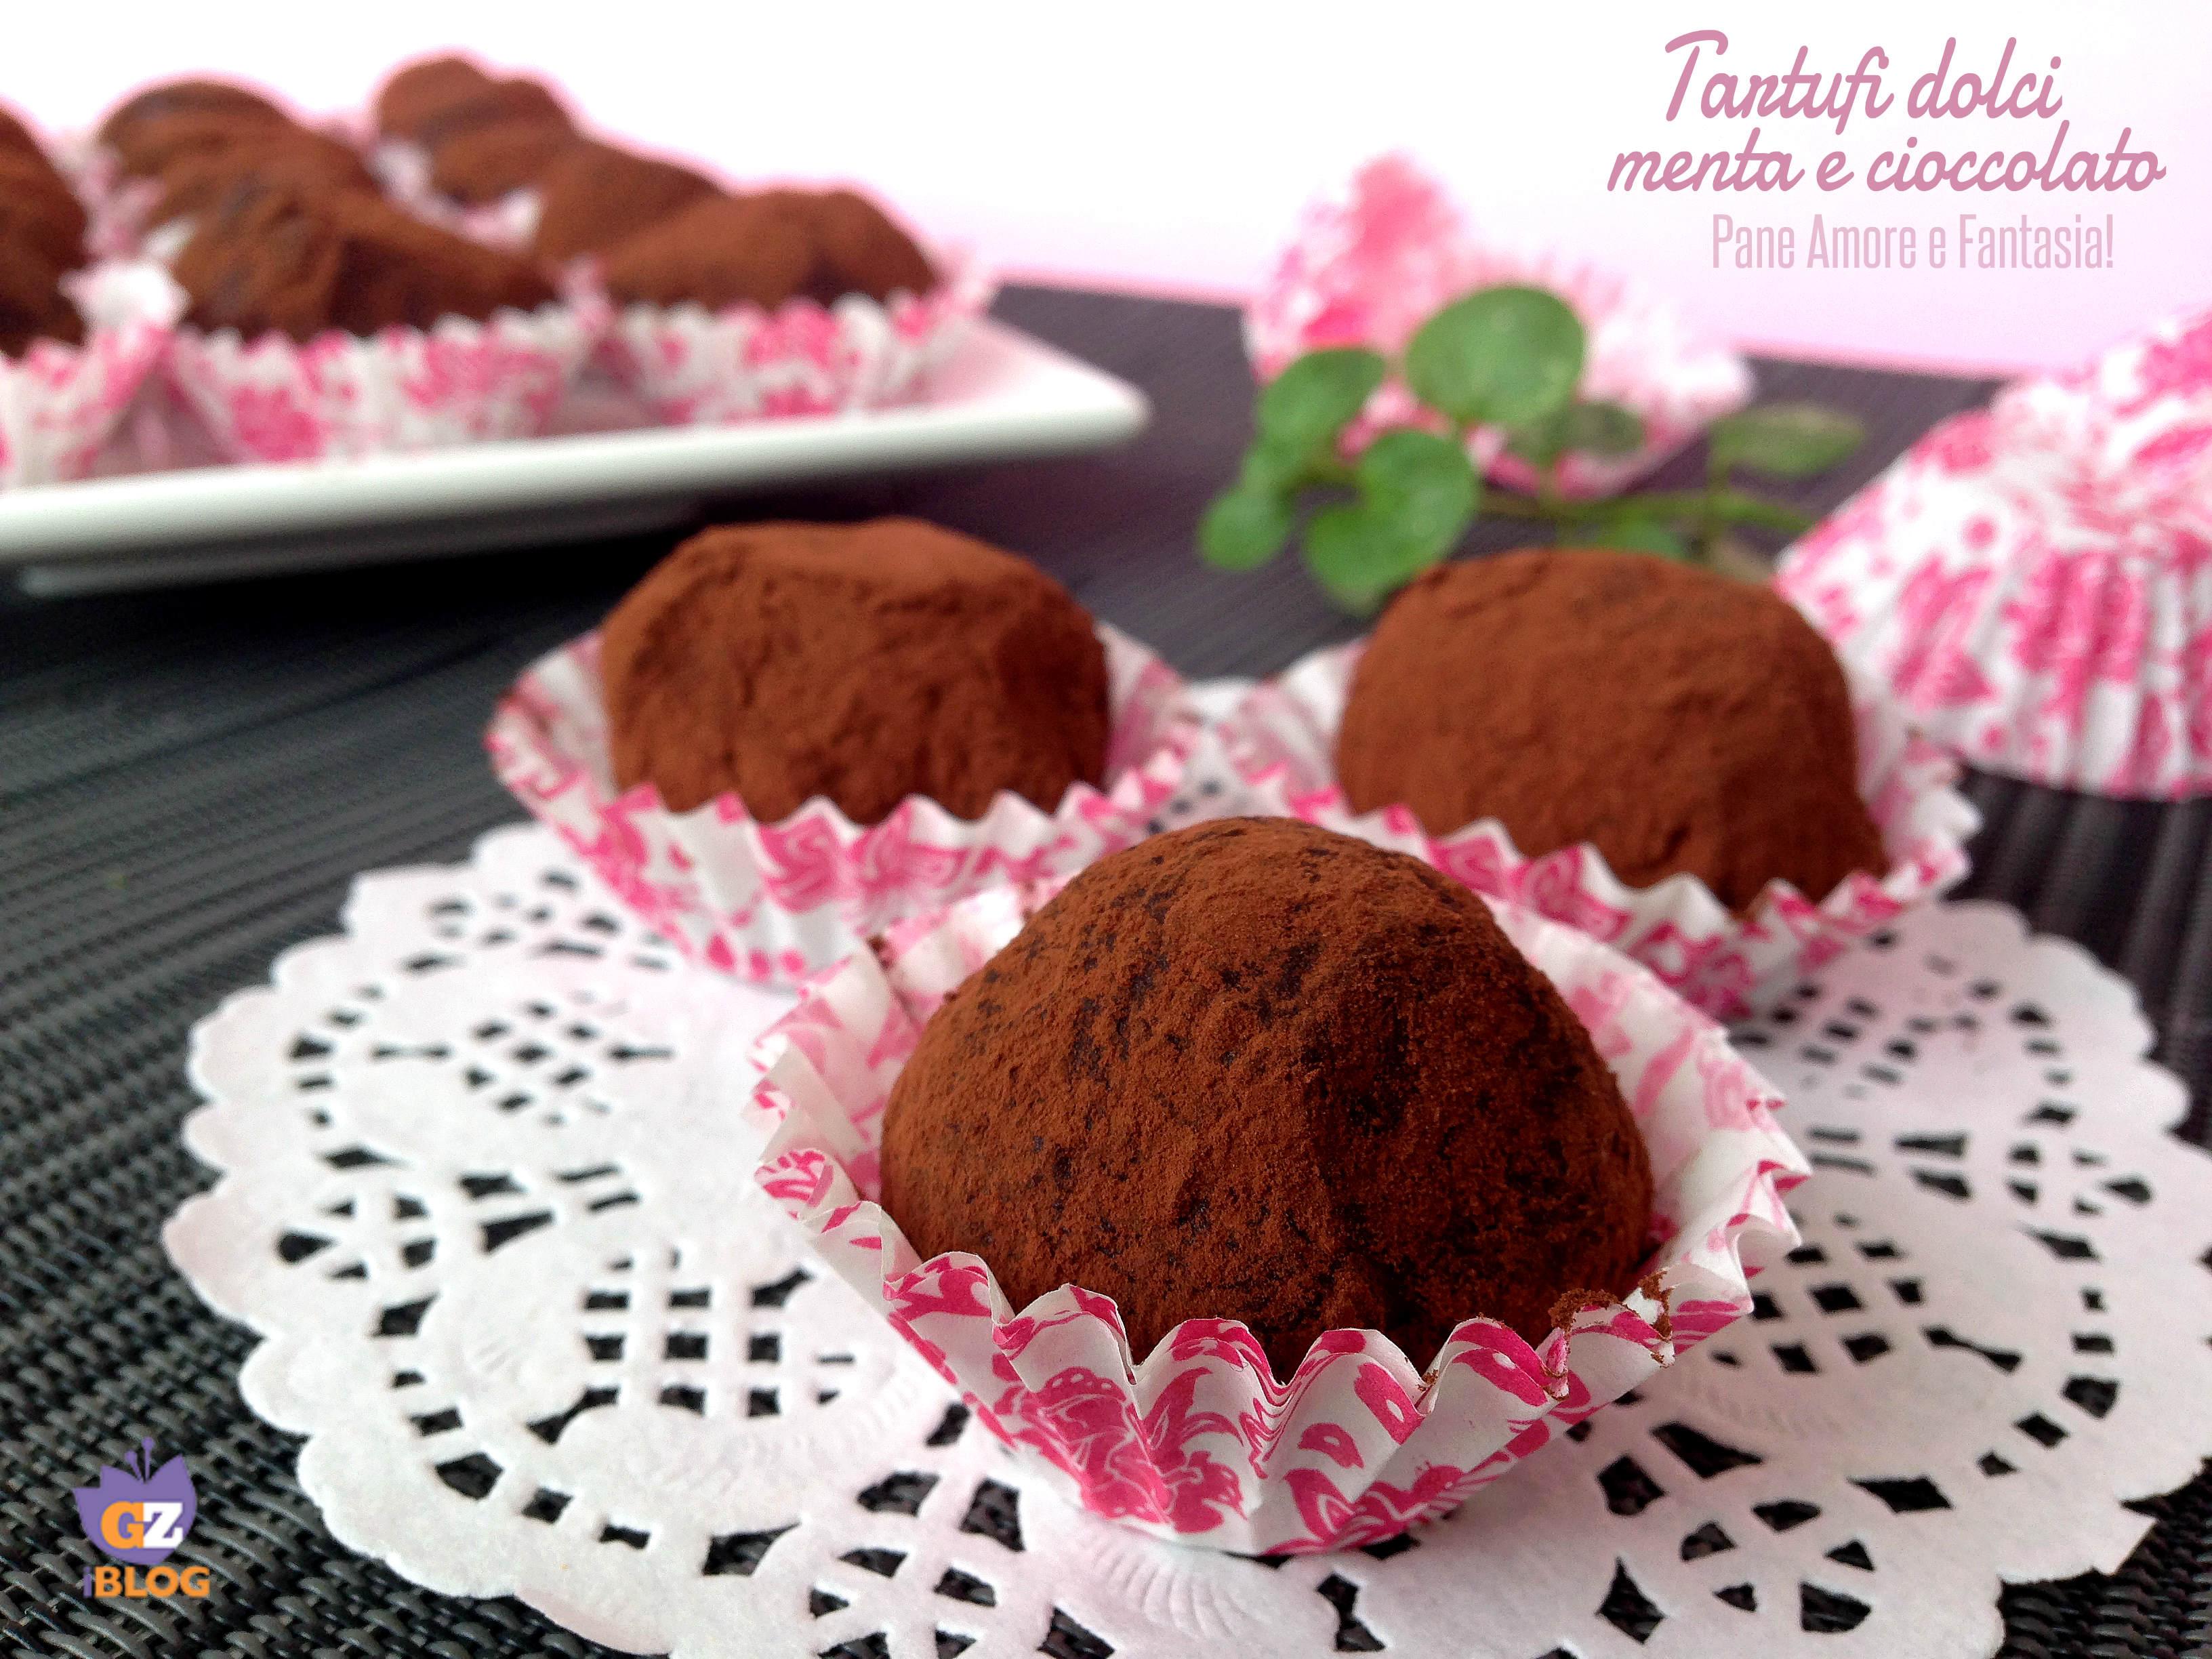 Tartufi dolci di cioccolato alla menta | Pane Amore e Fantasia!